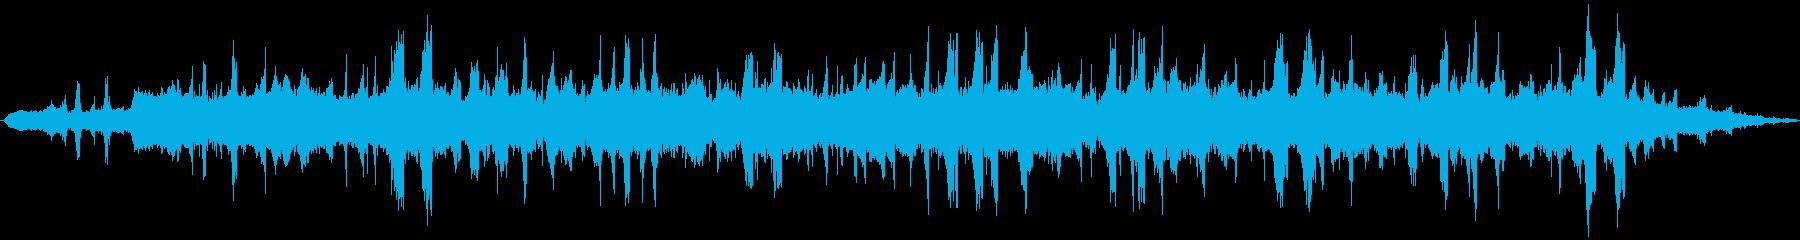 PADS グリッチートランス01の再生済みの波形